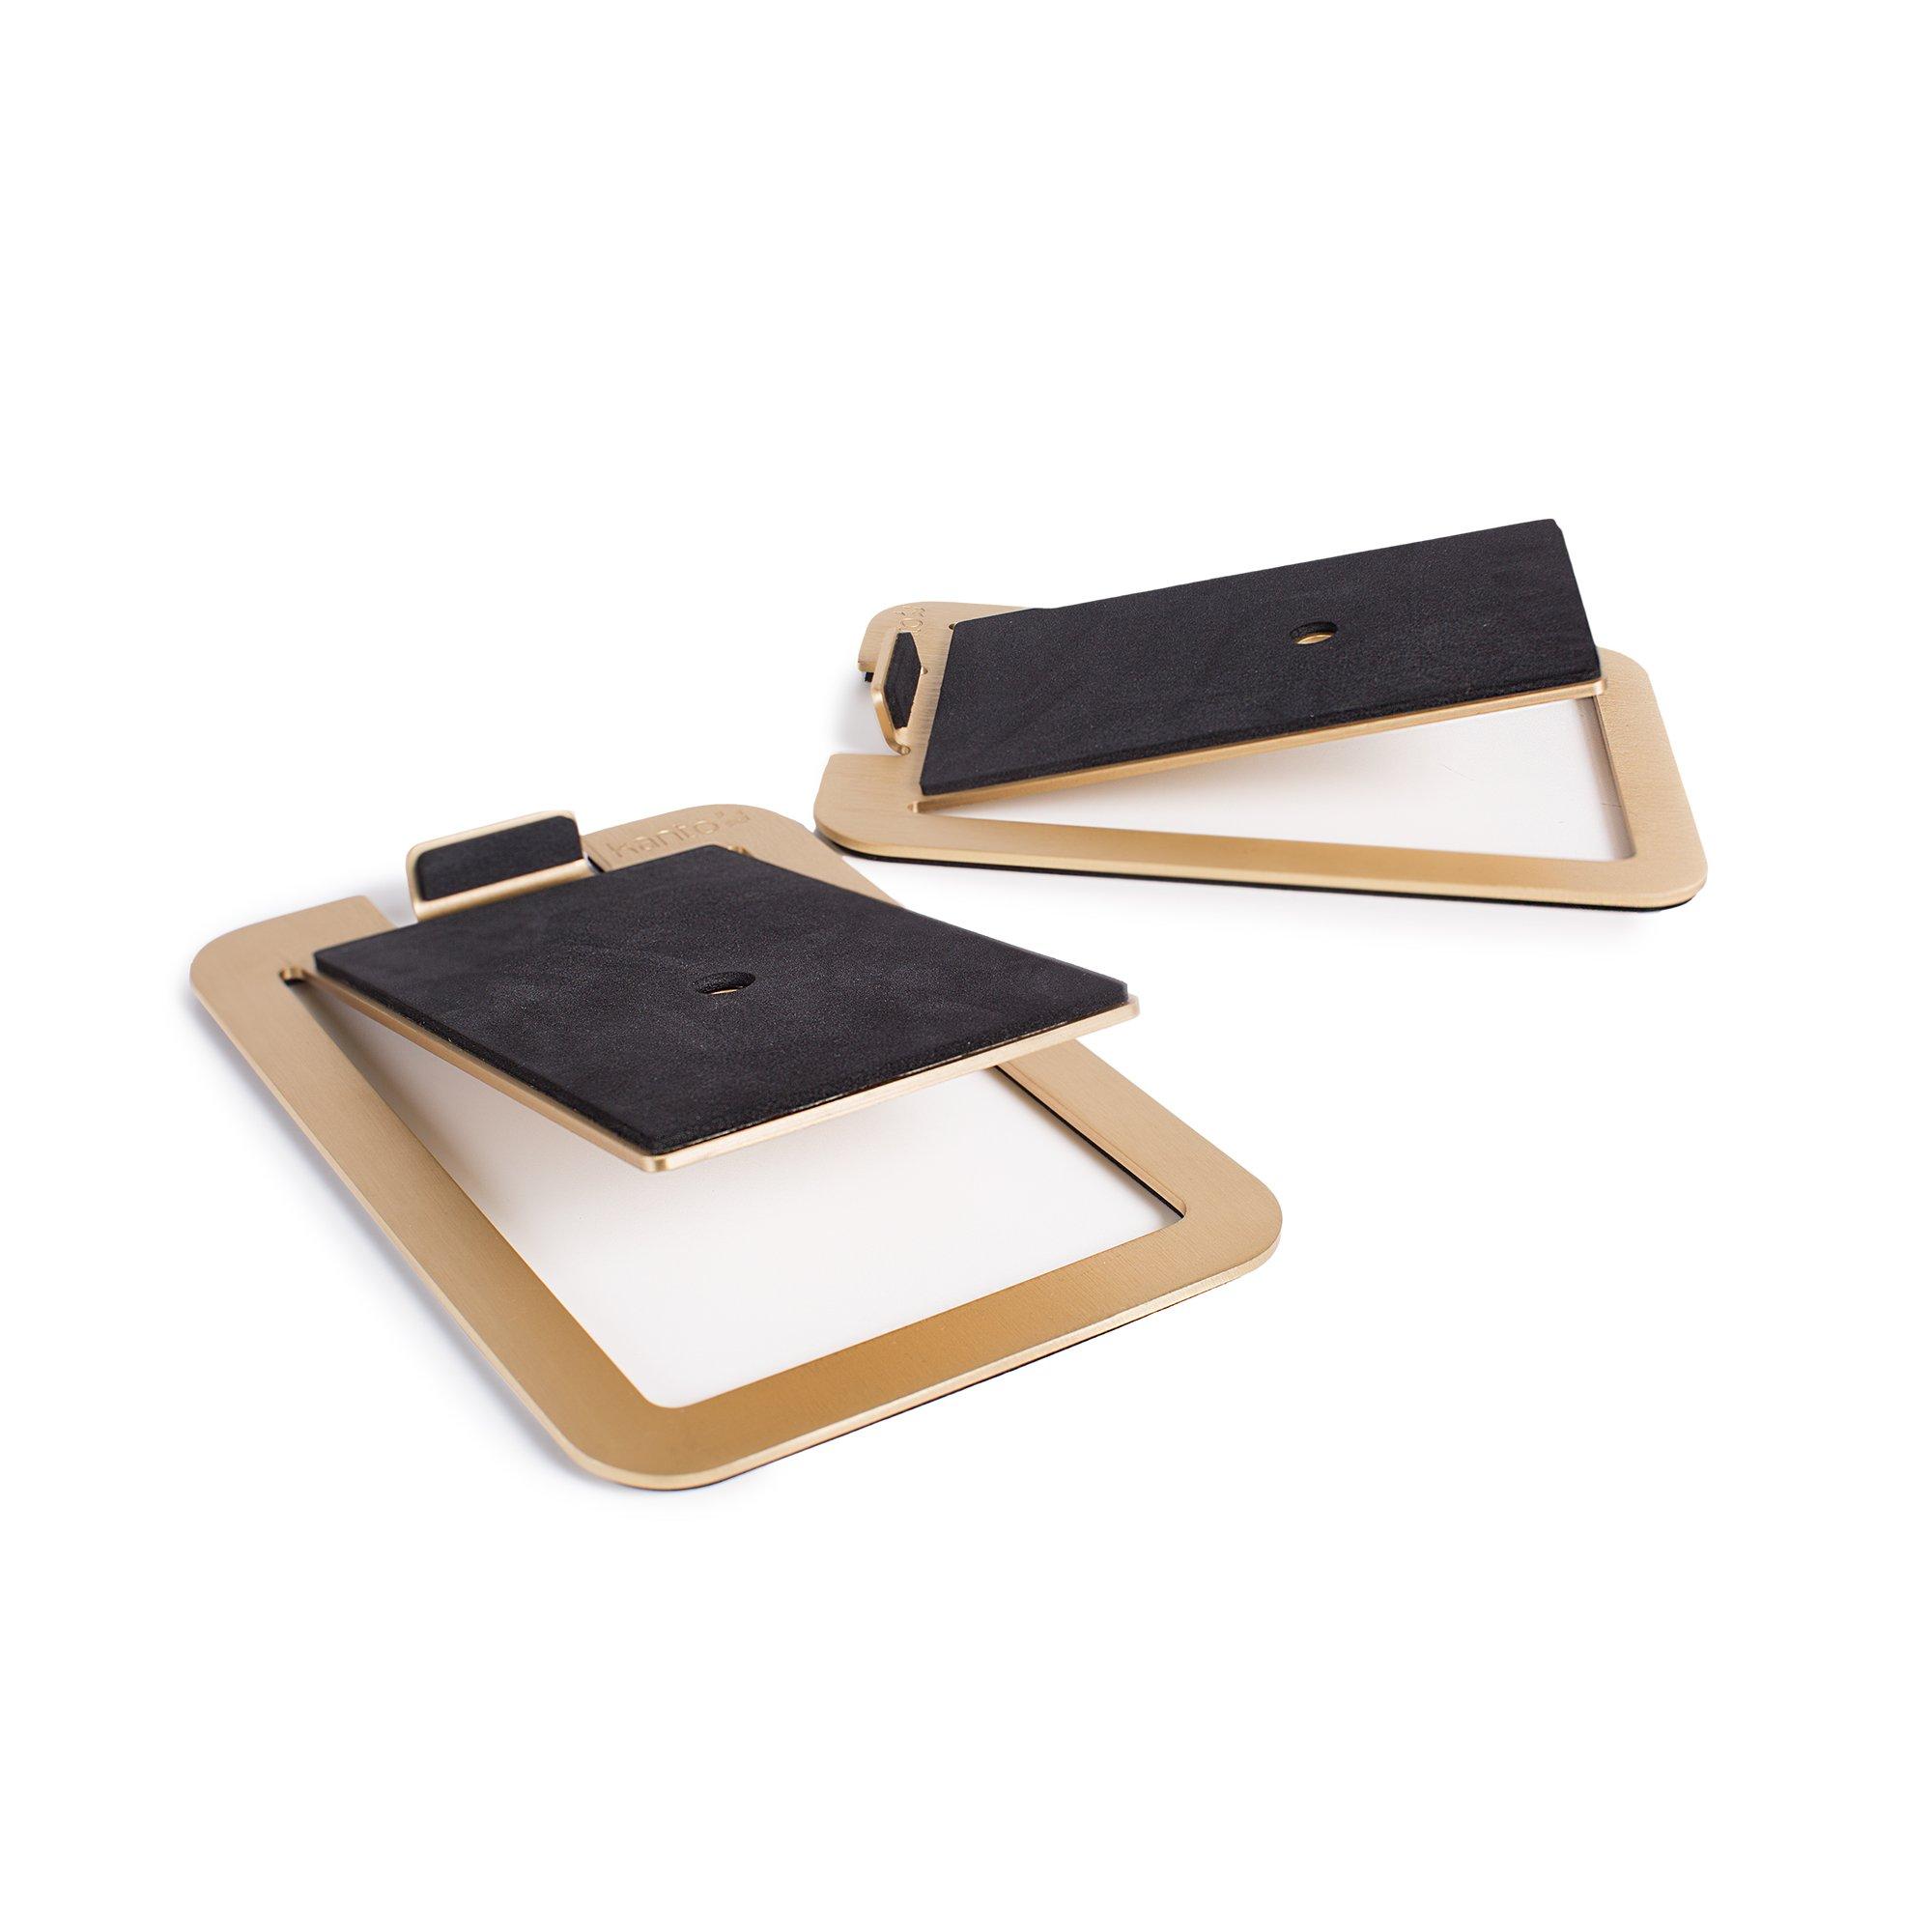 Kanto S4 Desktop Speaker Stands for Midsize Speakers, Brass